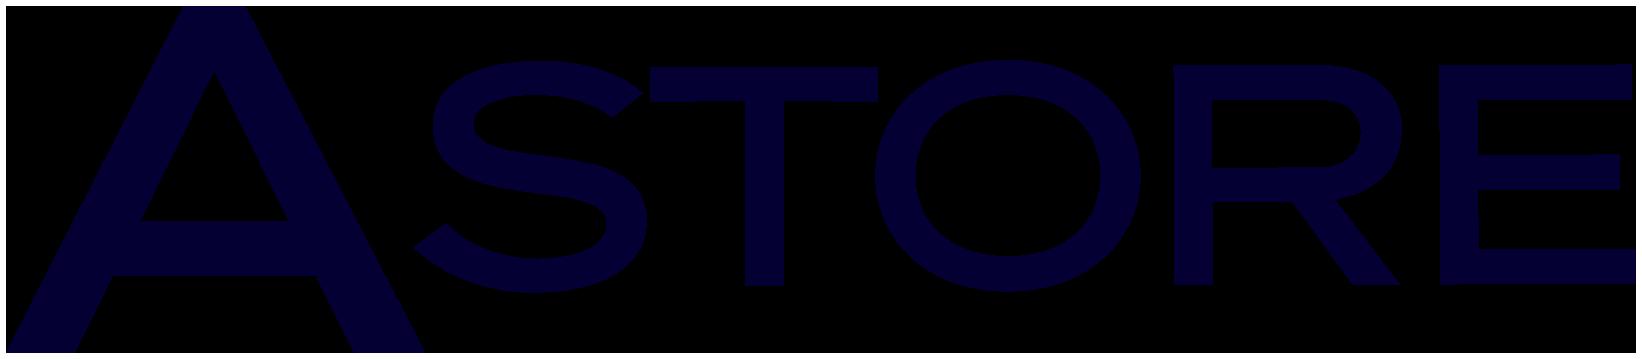 astore logo